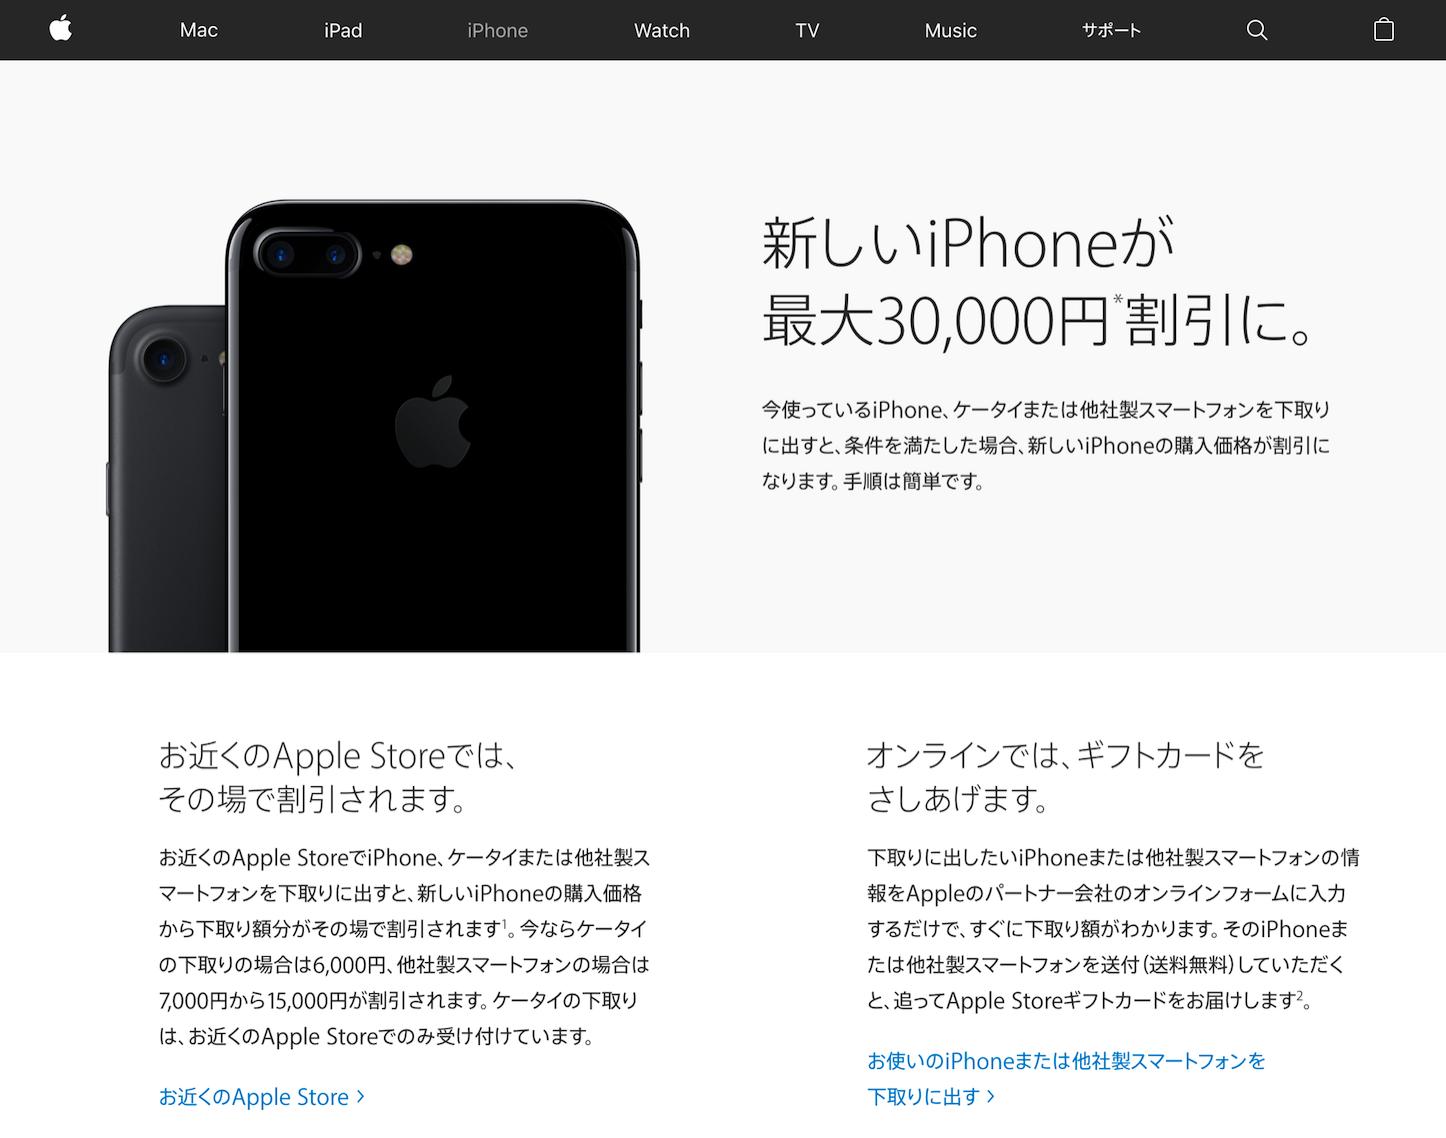 Apple iPhone Tradein Program